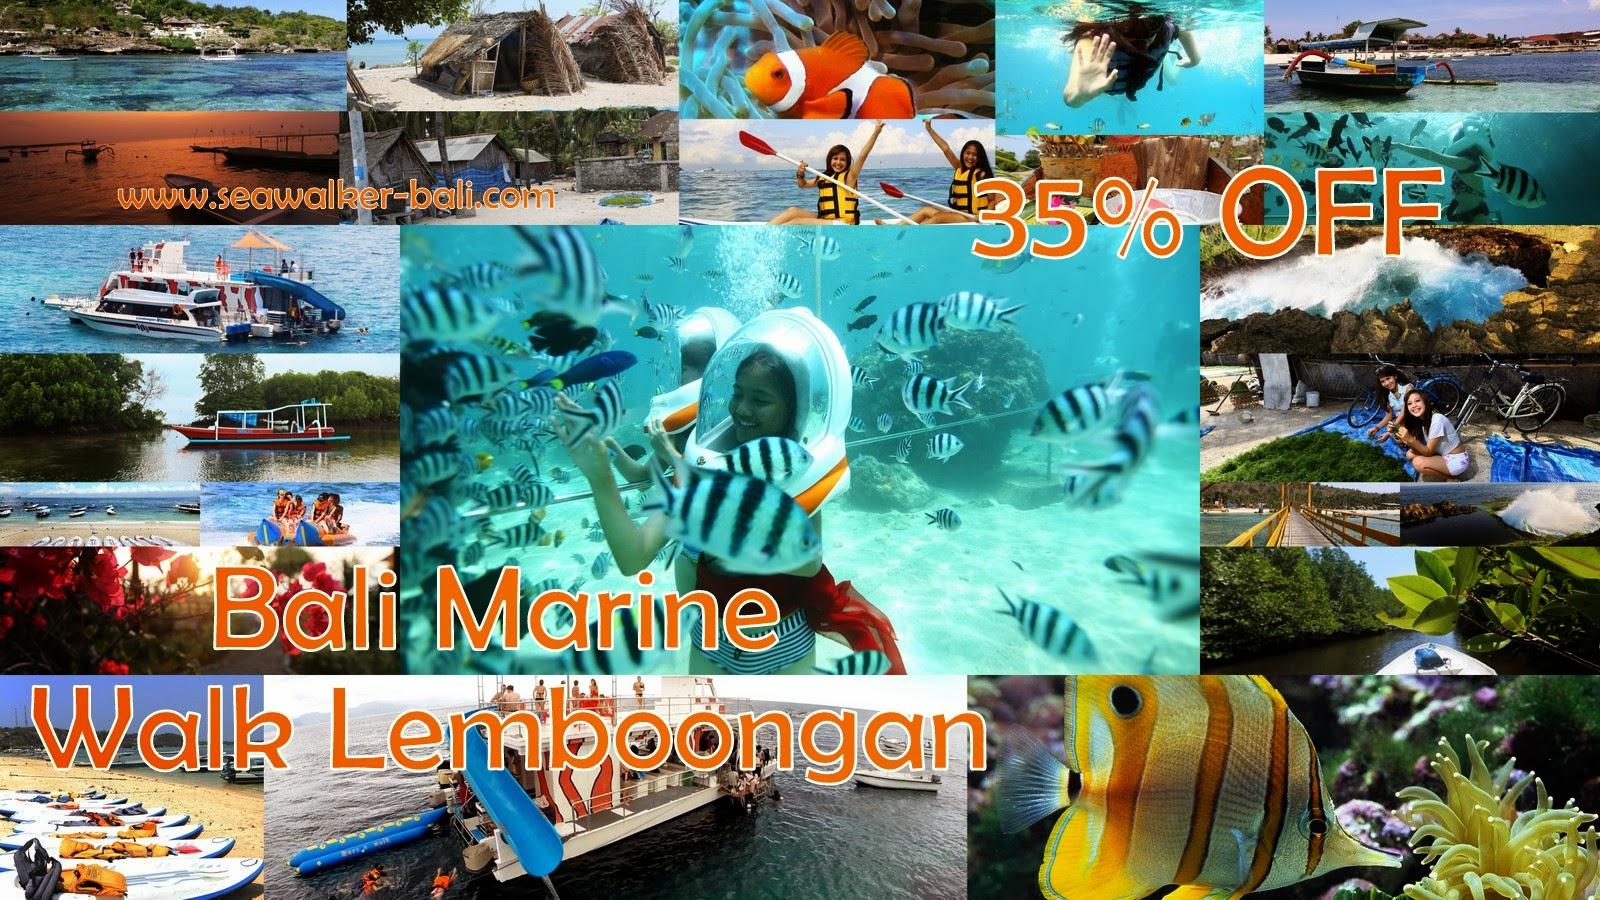 Bali Marine Walk Lembongan Rp 650000 Free Photo Paket Honeymoon Nusa Penida 4 Hari 3 Malam Update 2018